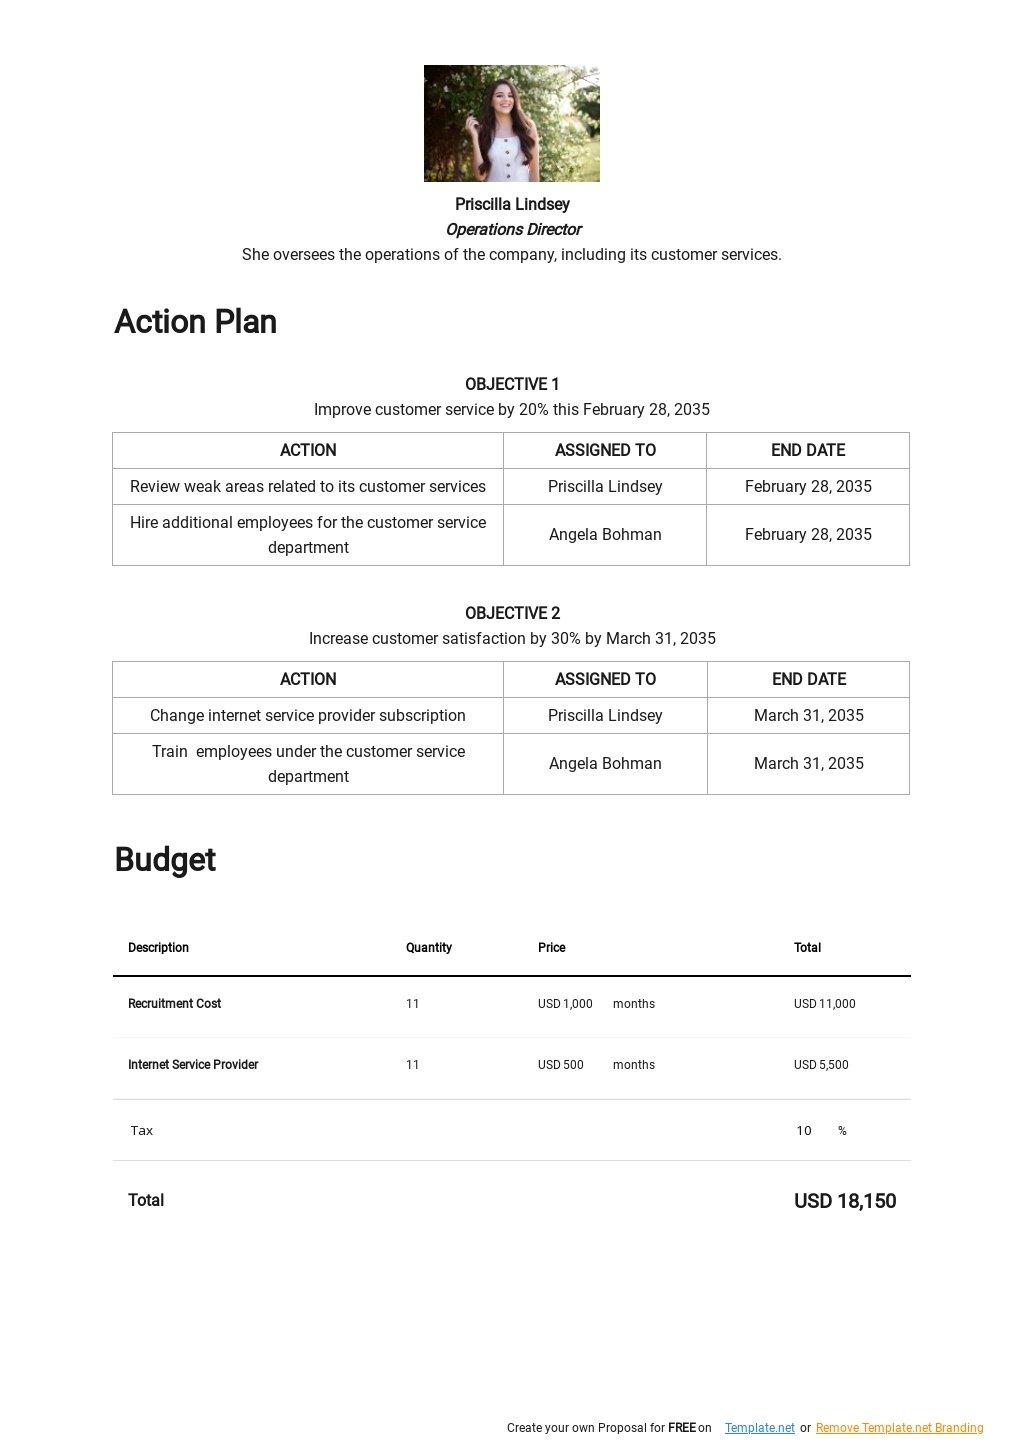 Customer Service Improvement Plan Template 2.jpe